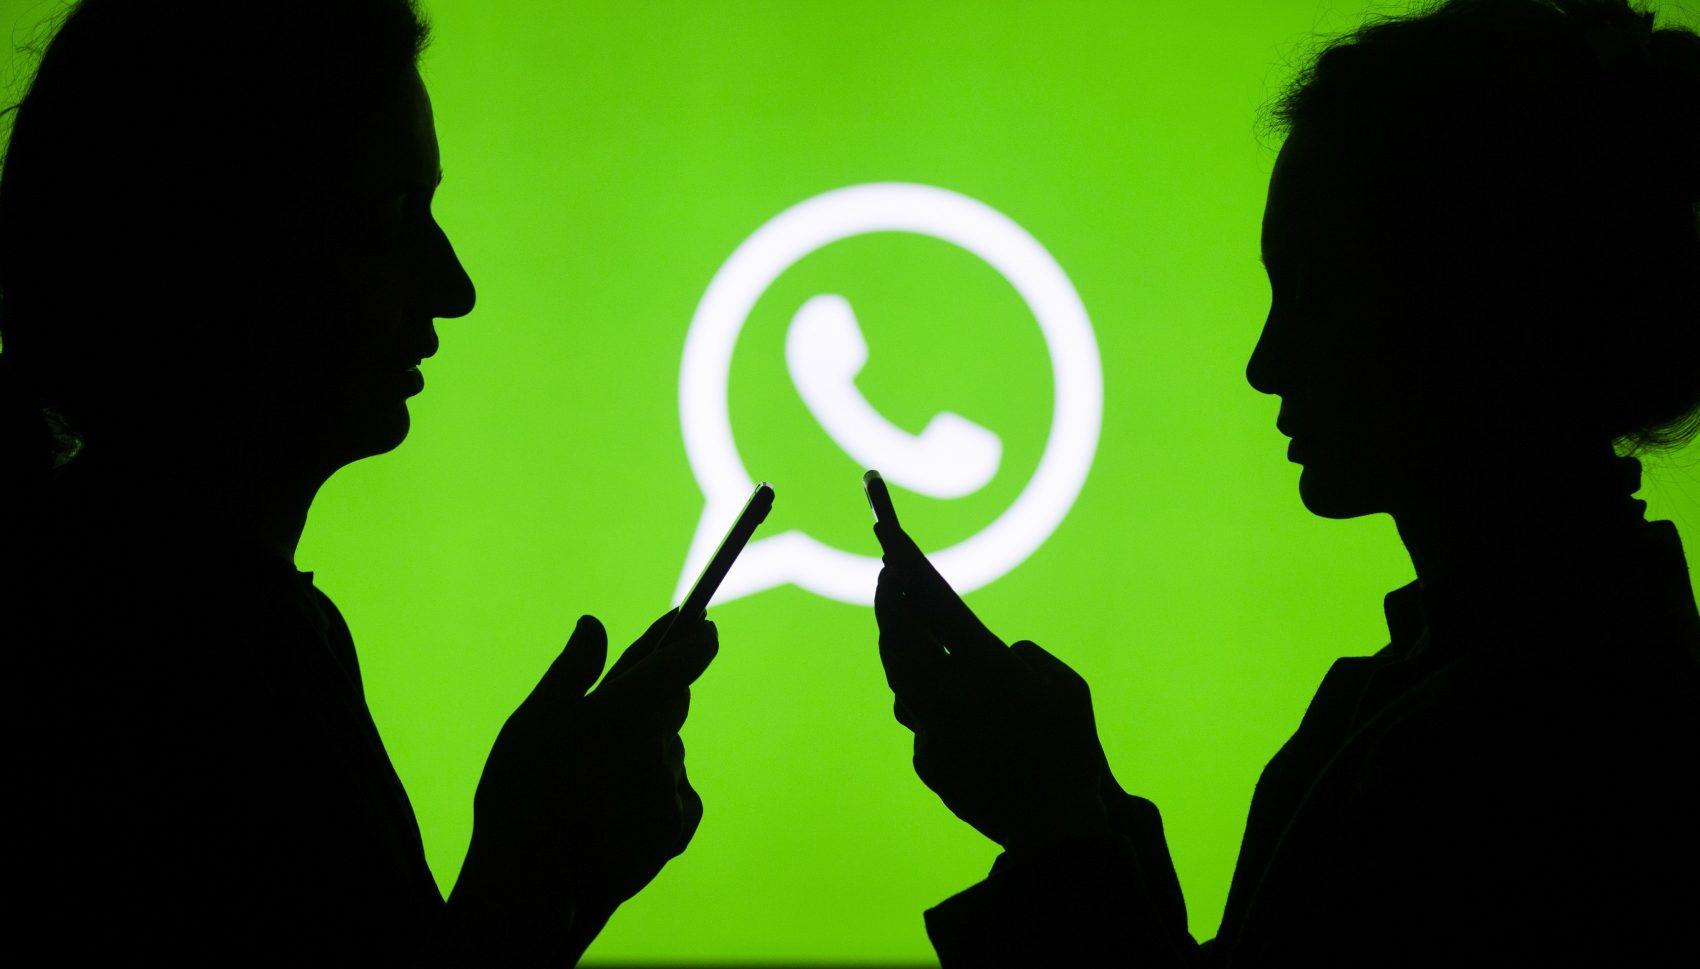 O Whatsapp é o protagonista da campanha presidencial 2018 (Foto Anadolu Agency)